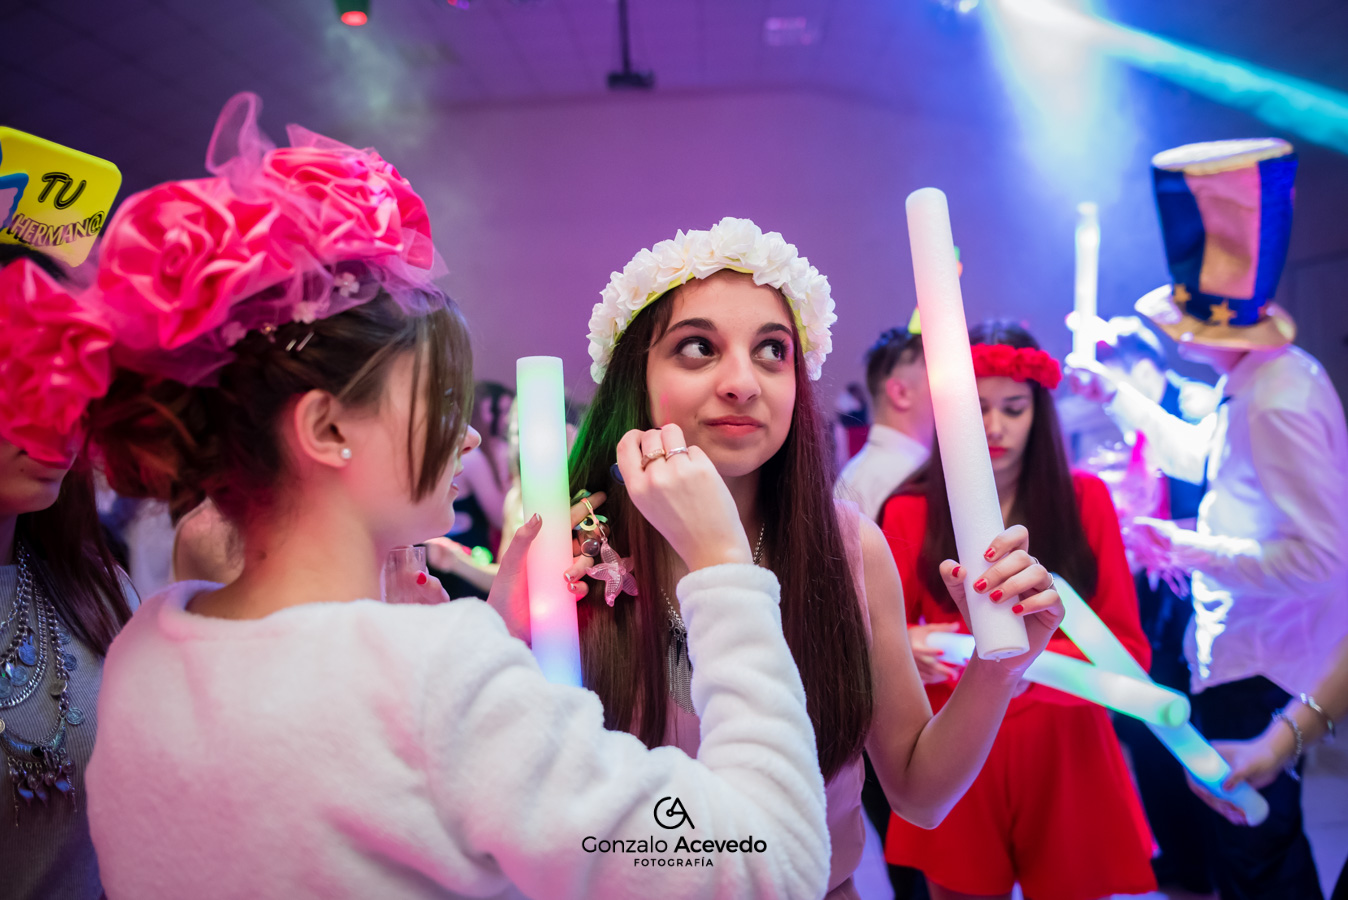 57-maru-fiesta-evento-cumpleanos-15-an-lorena-nobile-nancy-cergneux-entre-rios-salones-gonzalo-acevedo-fotografia